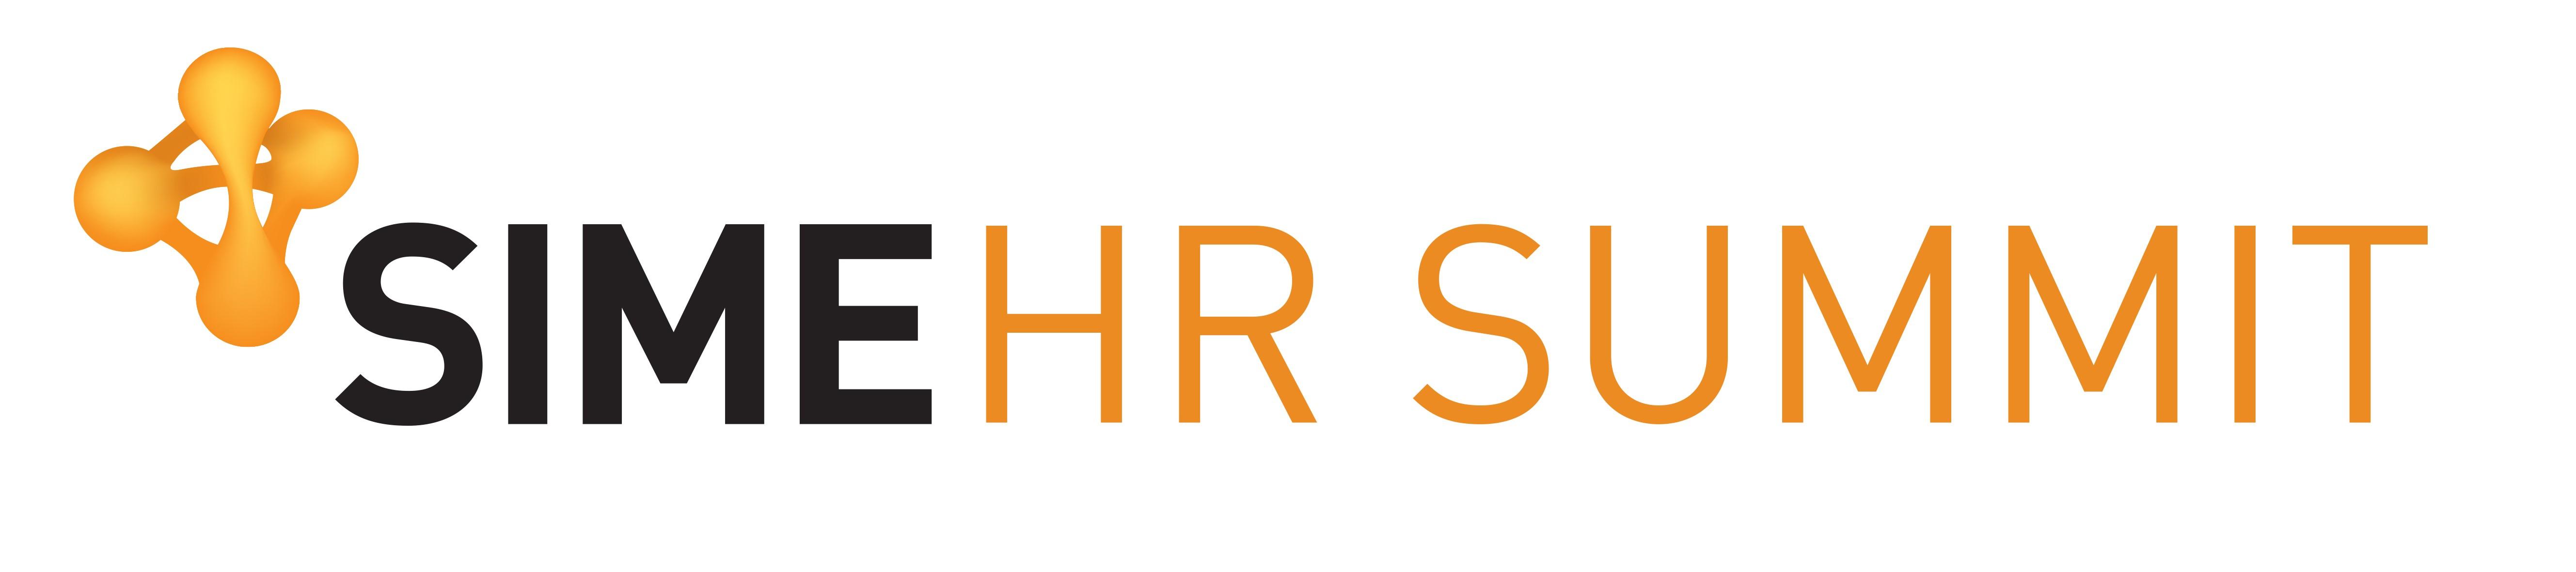 SIME_HR_SUMMIT_draft1-1